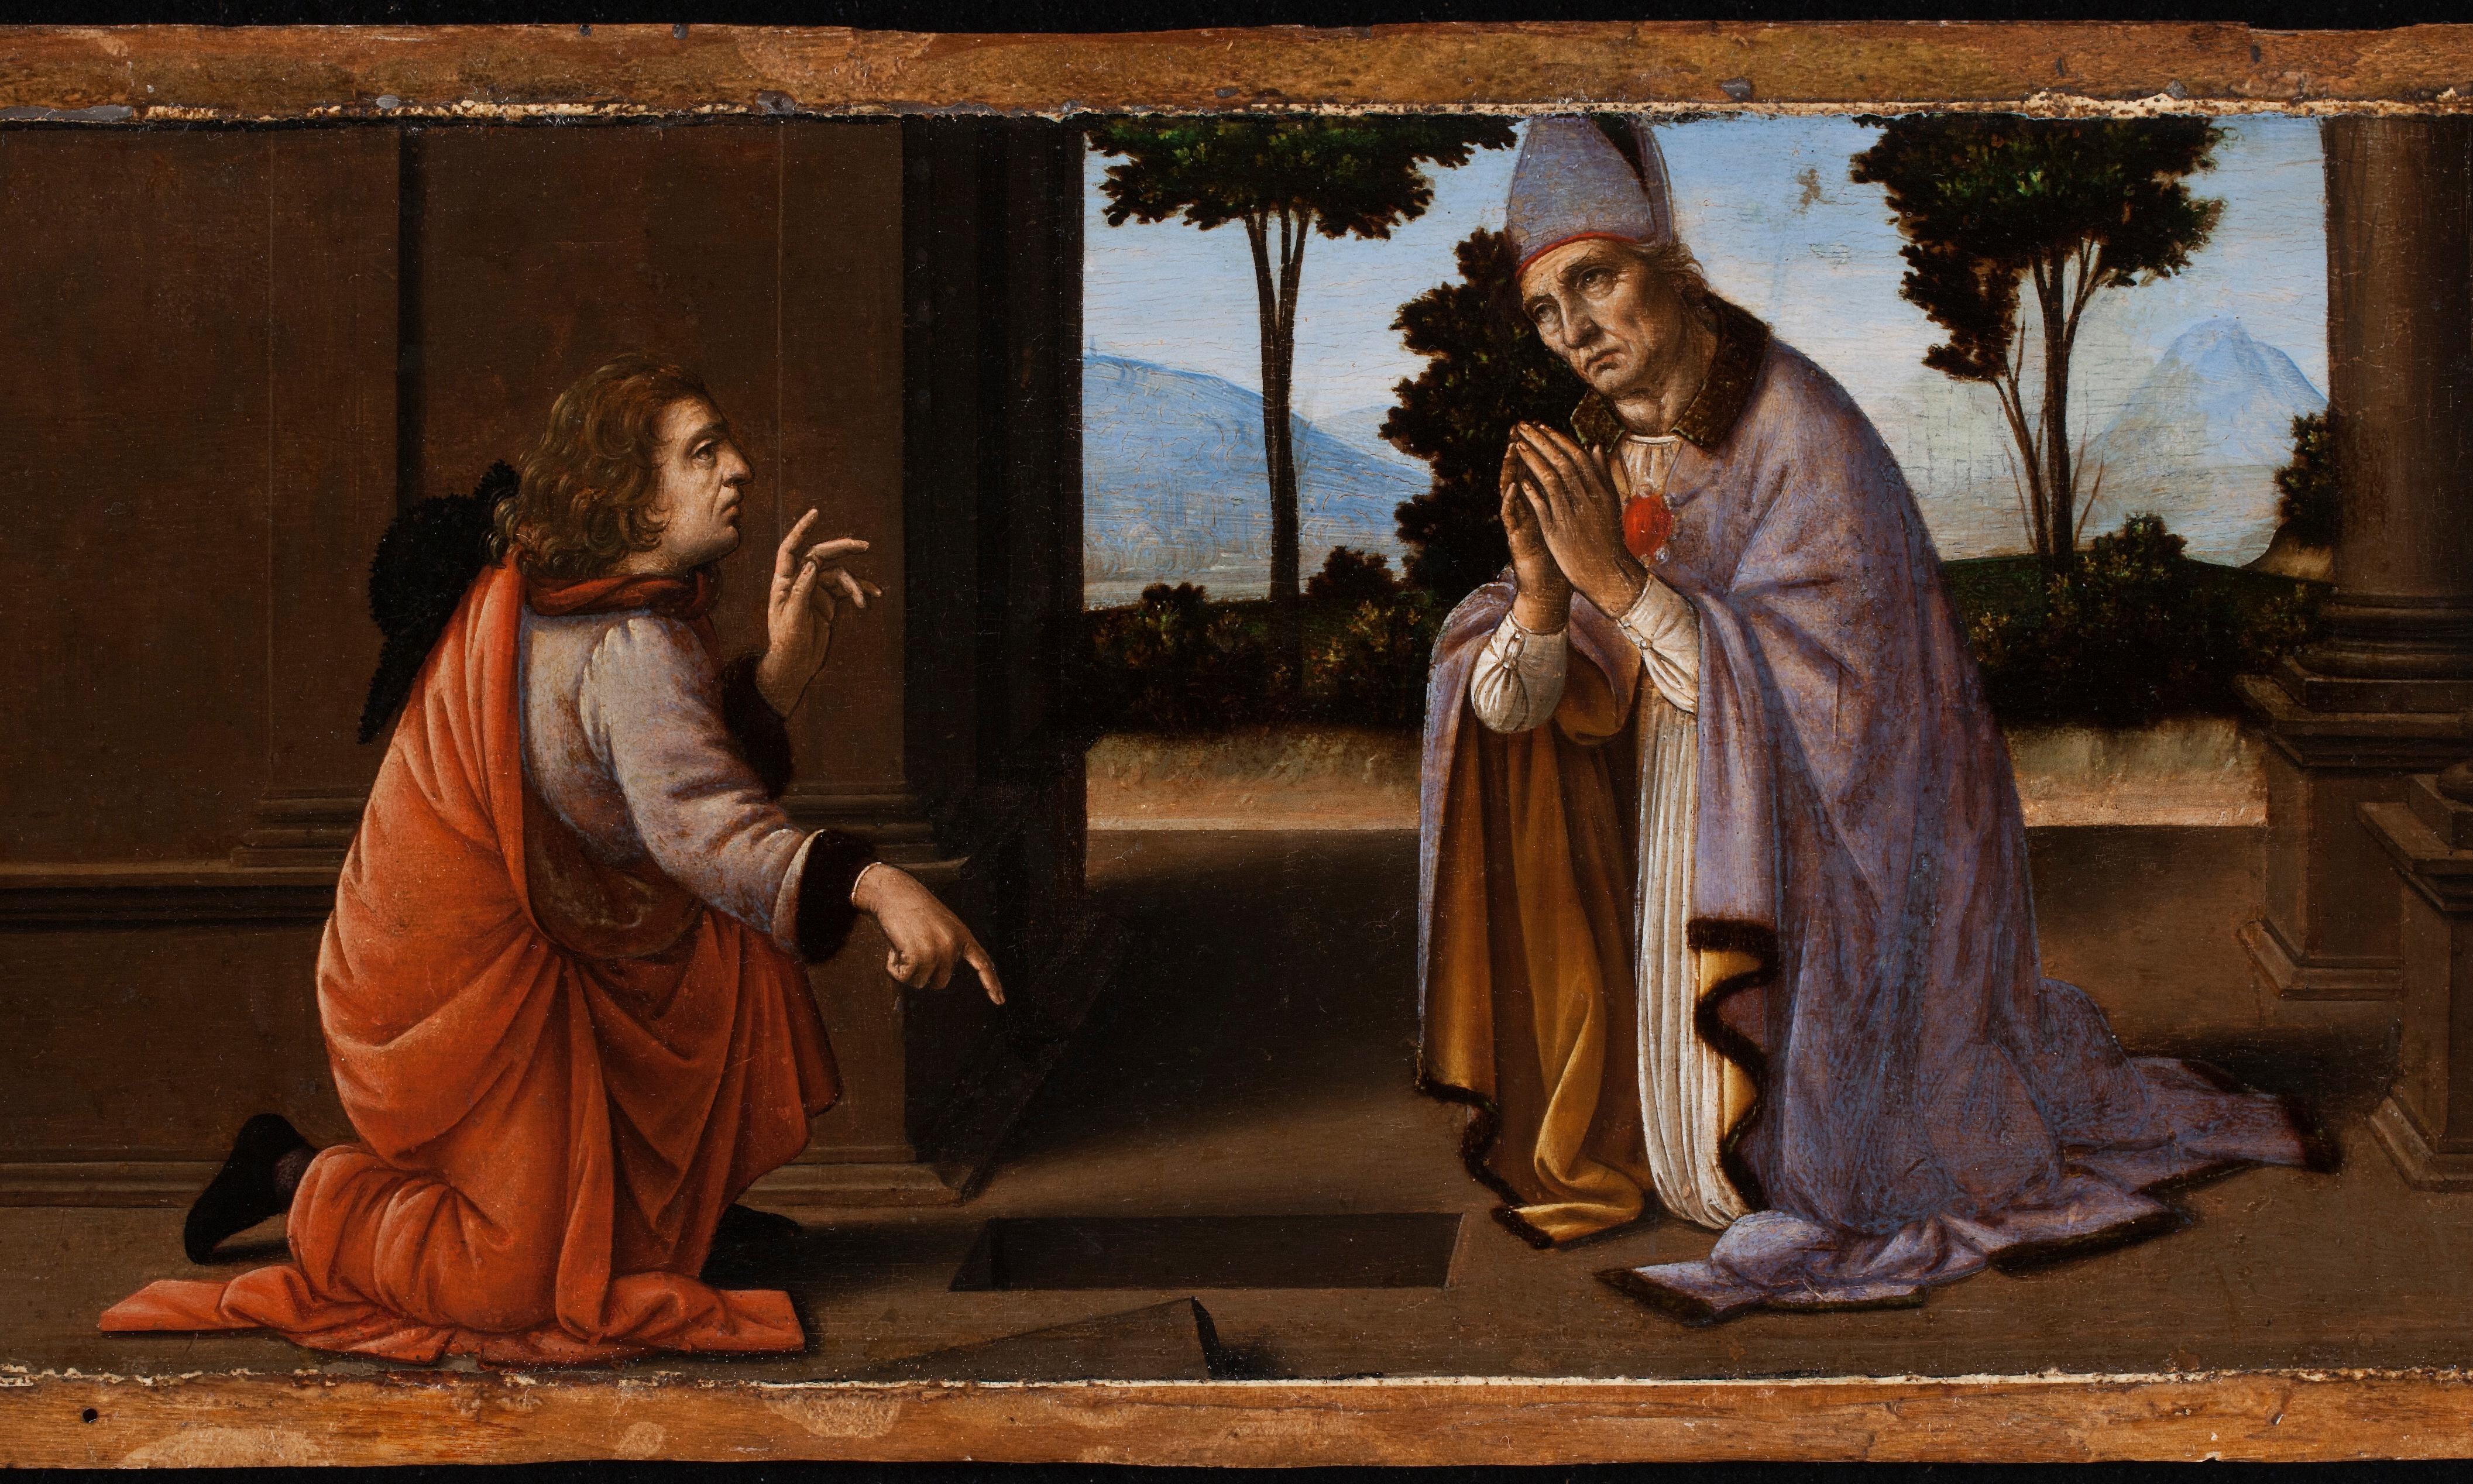 Revealed: 'perfectly realised' early work by Leonardo da Vinci